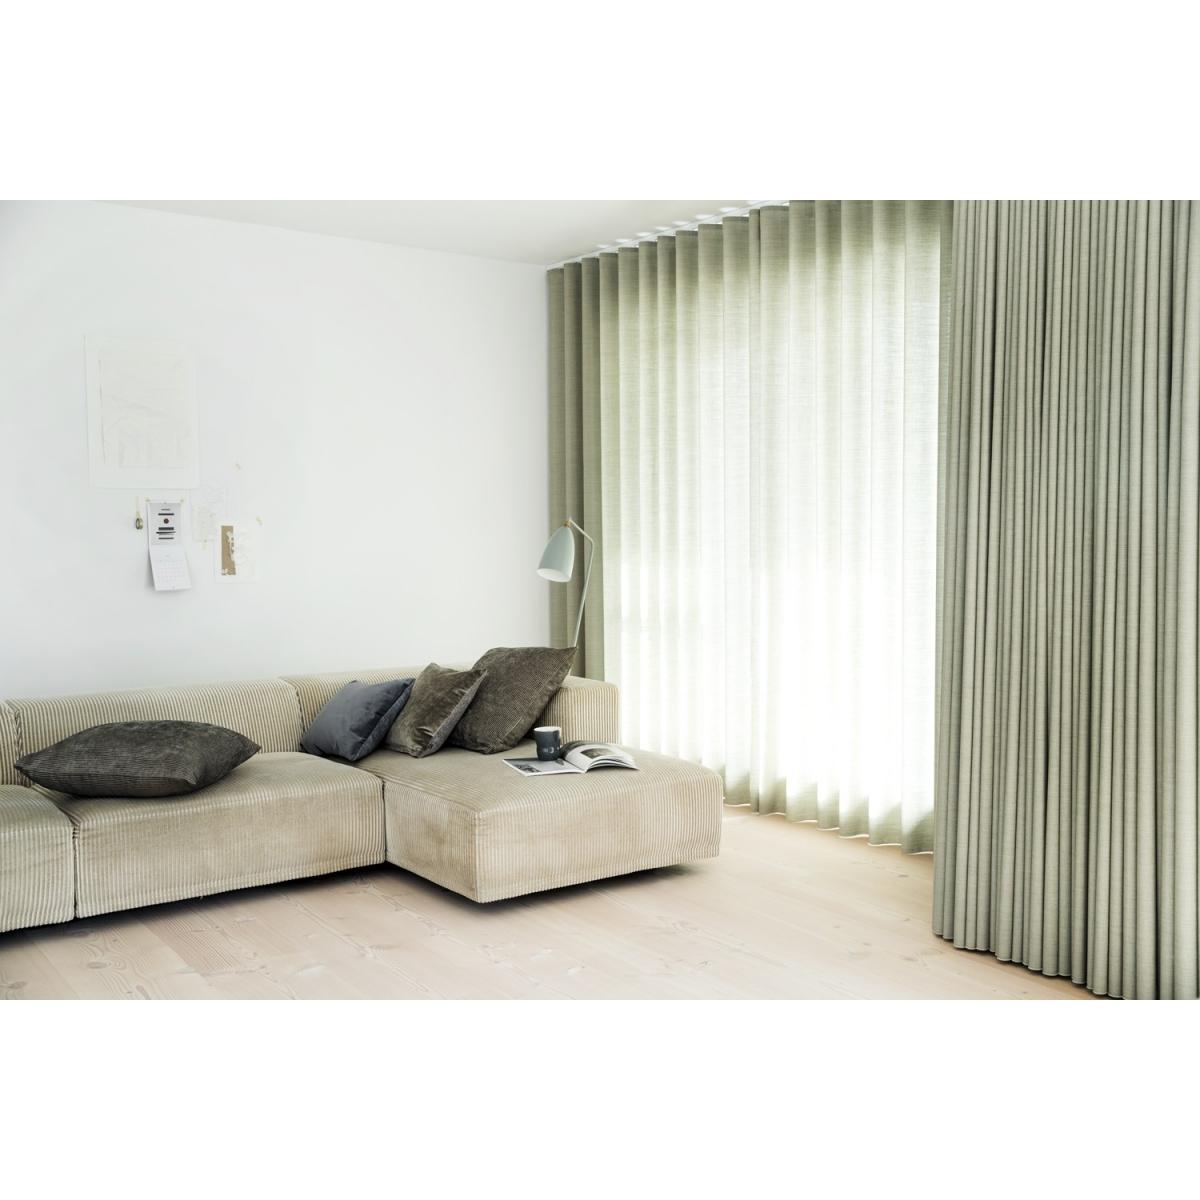 Stila - Lounge living